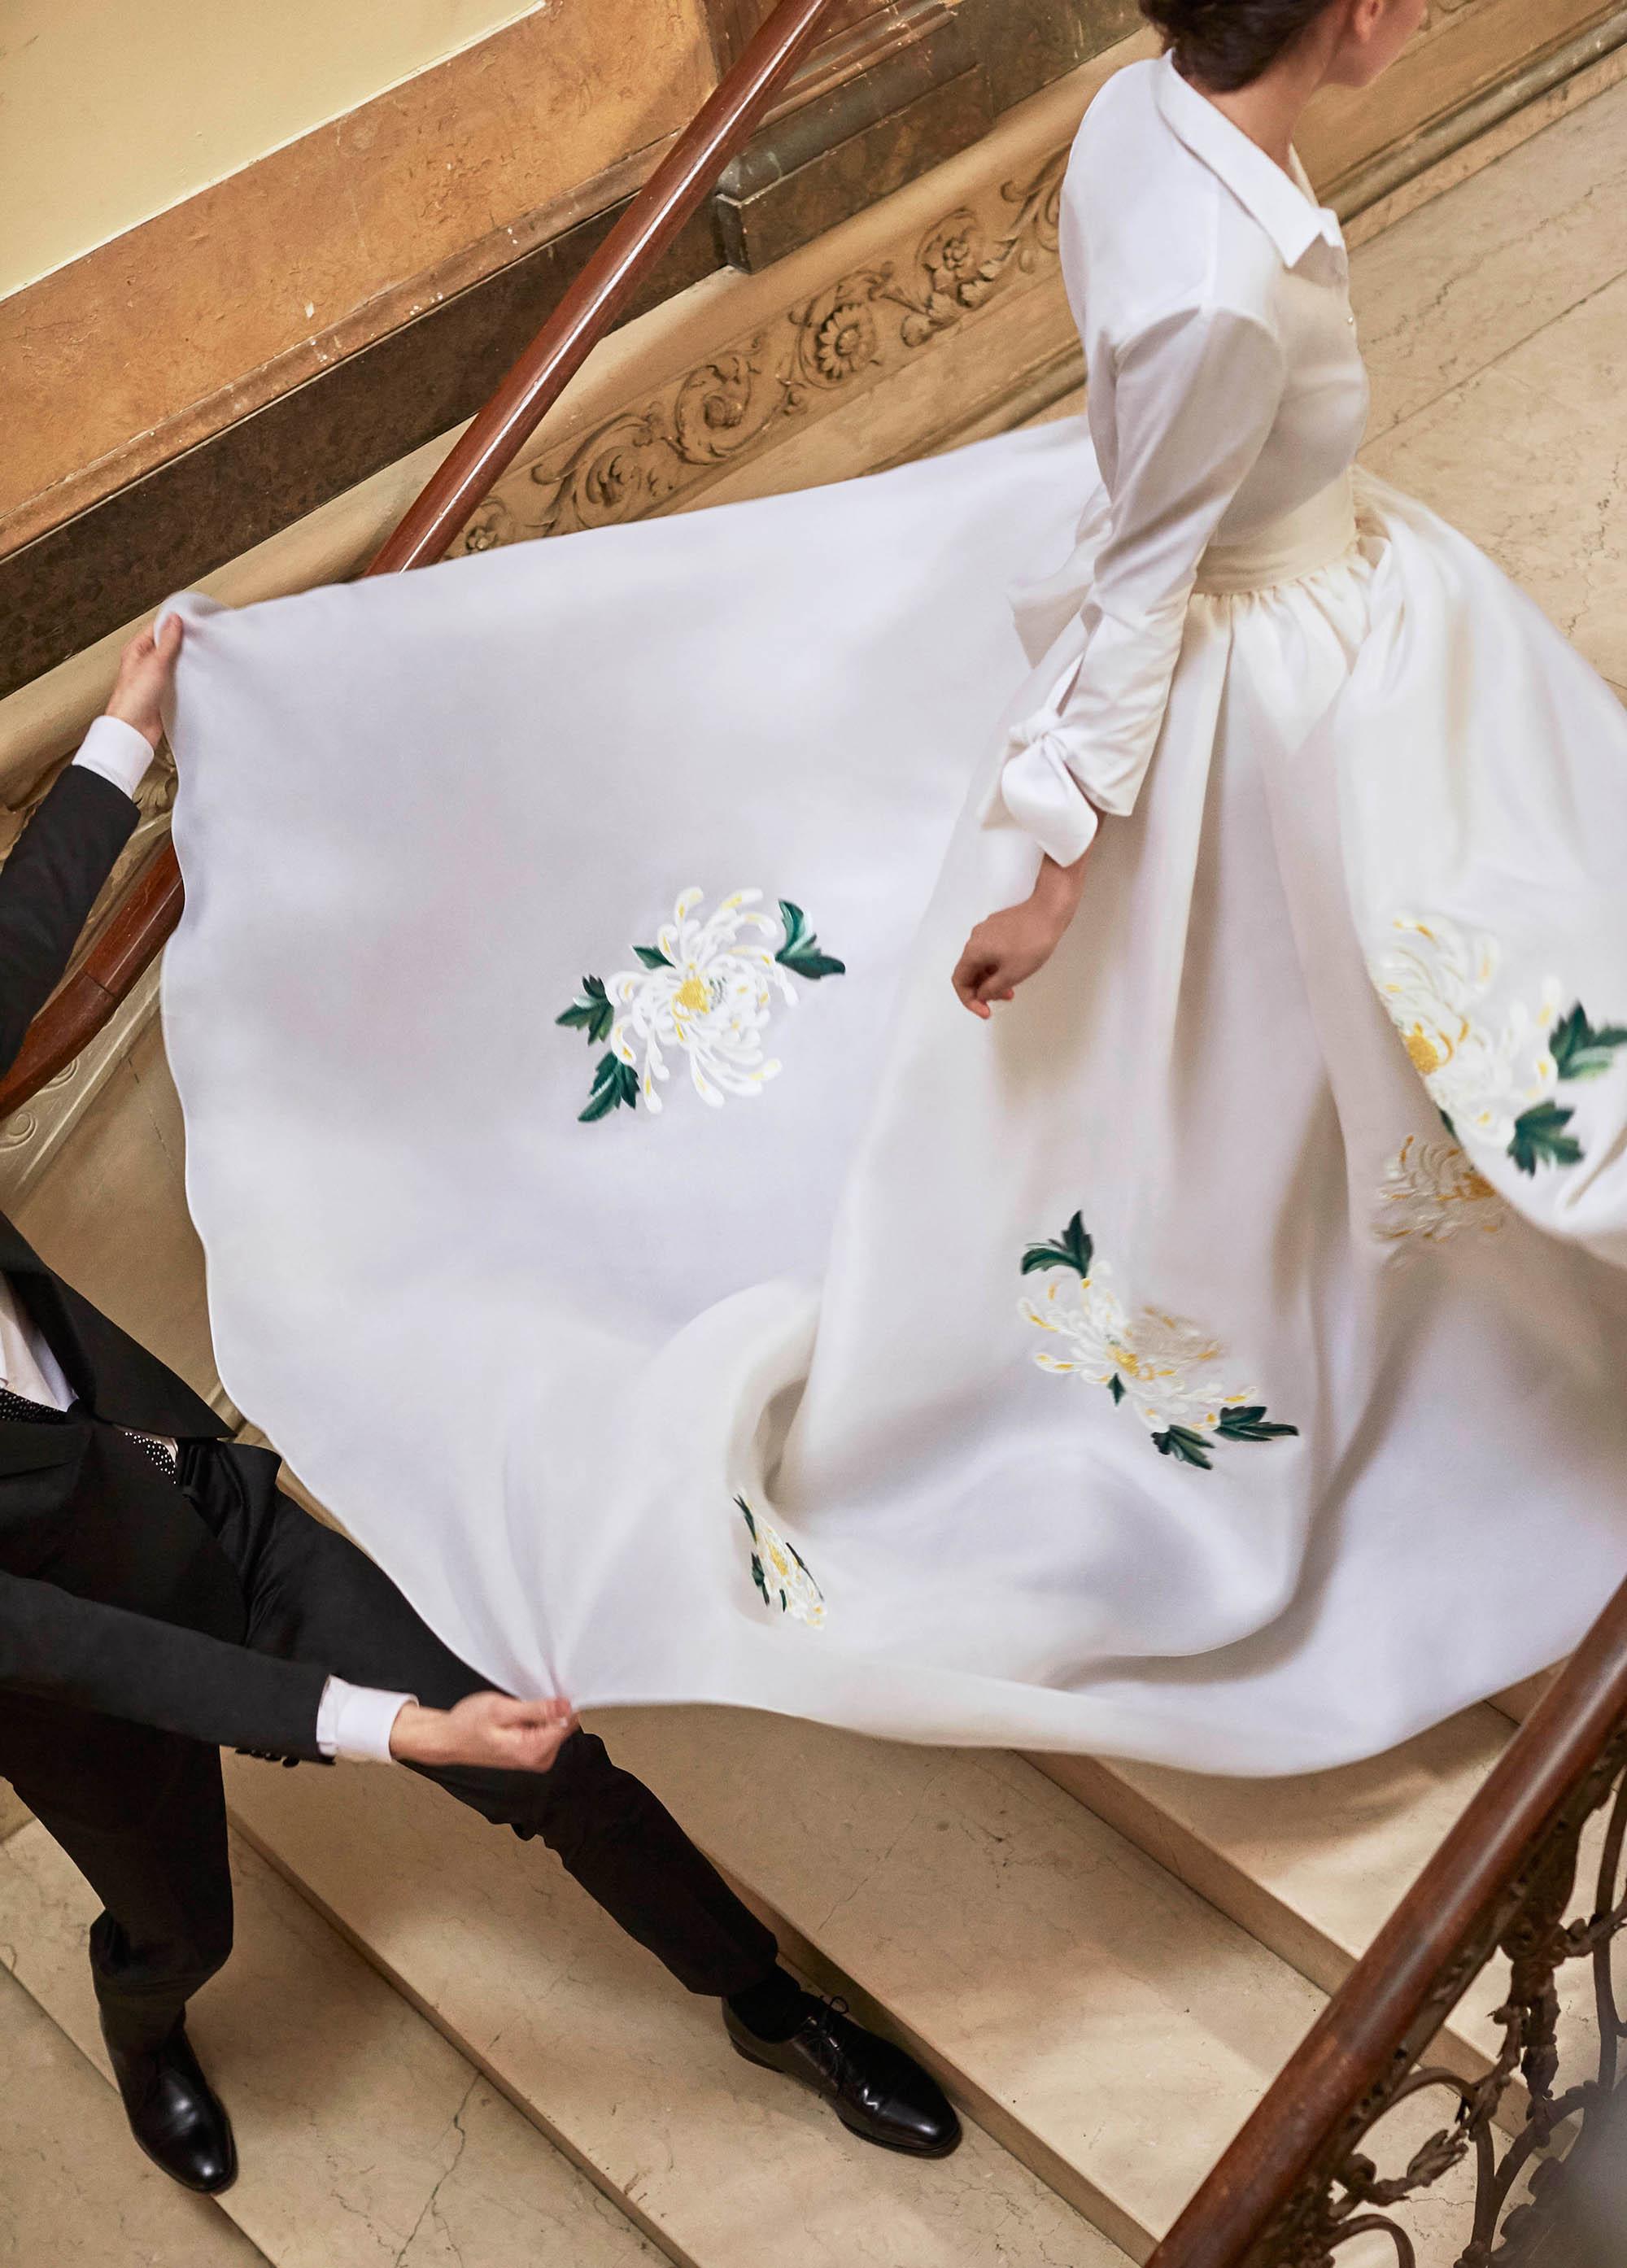 Carolina Herrera wedding dress spring 2019 floral shirtdress a-line long sleeve gown